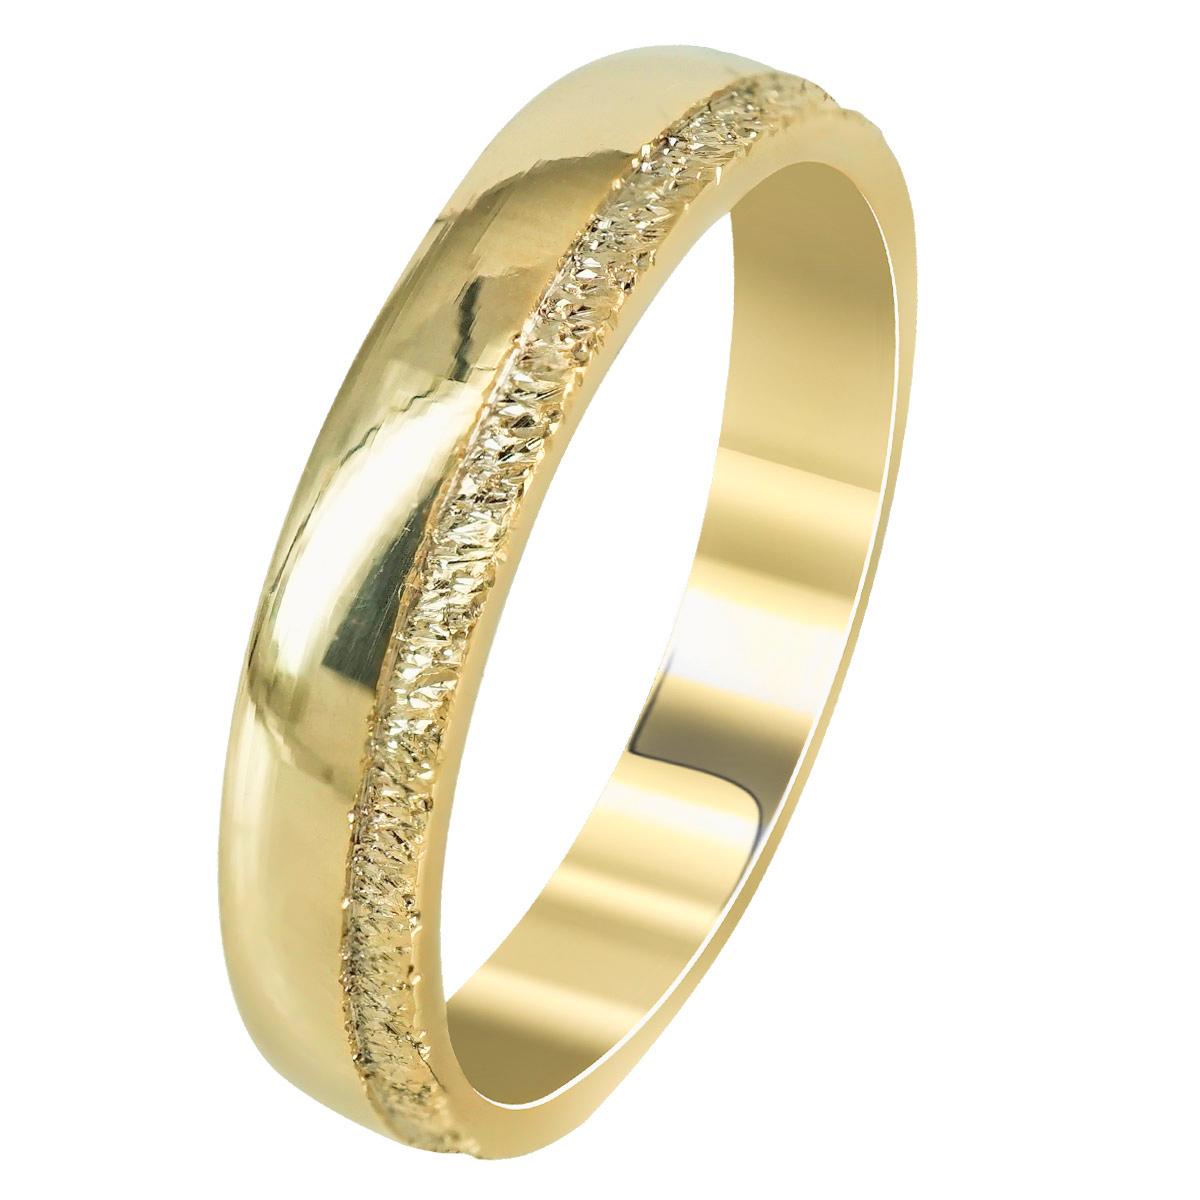 Kίτρινη Χρυσή Βέρα Γάμου WR263 k14